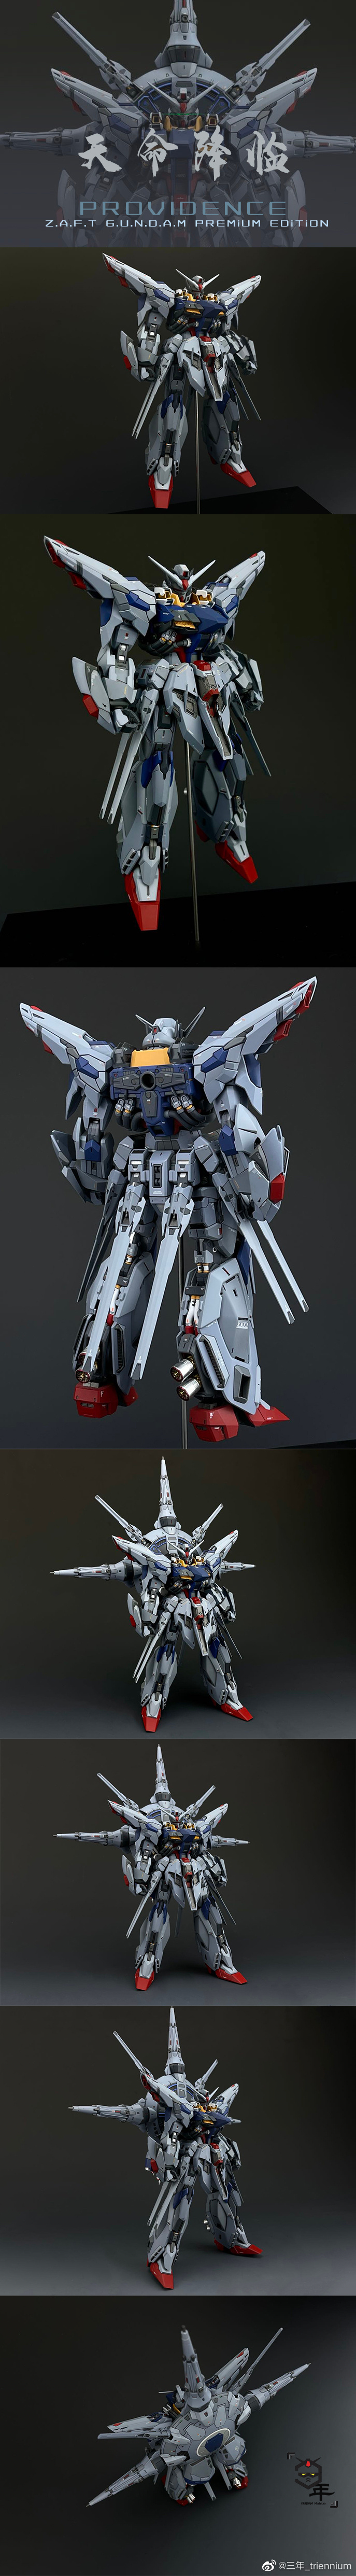 G257_ZGMF_X13A_providence_yujiao_001.jpg